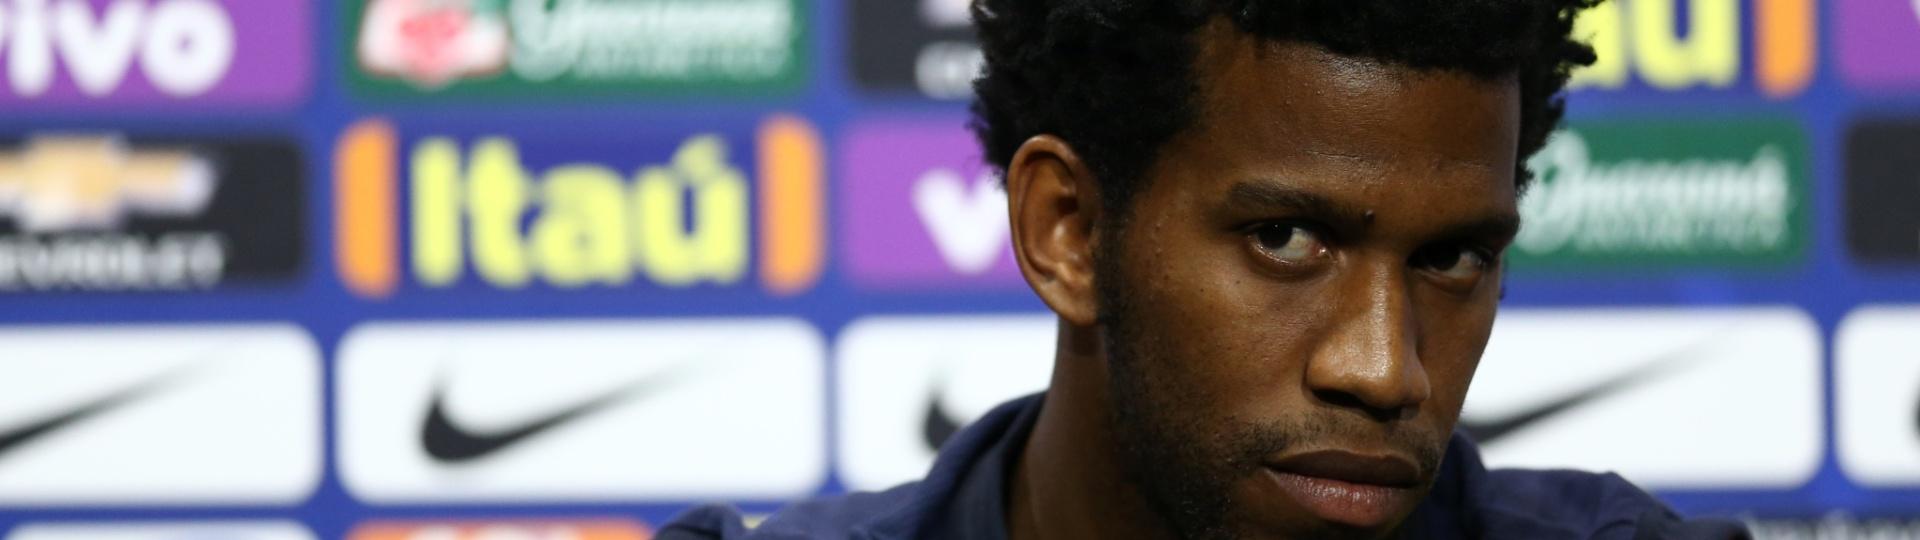 Gil dá entrevistas na seleção brasileira